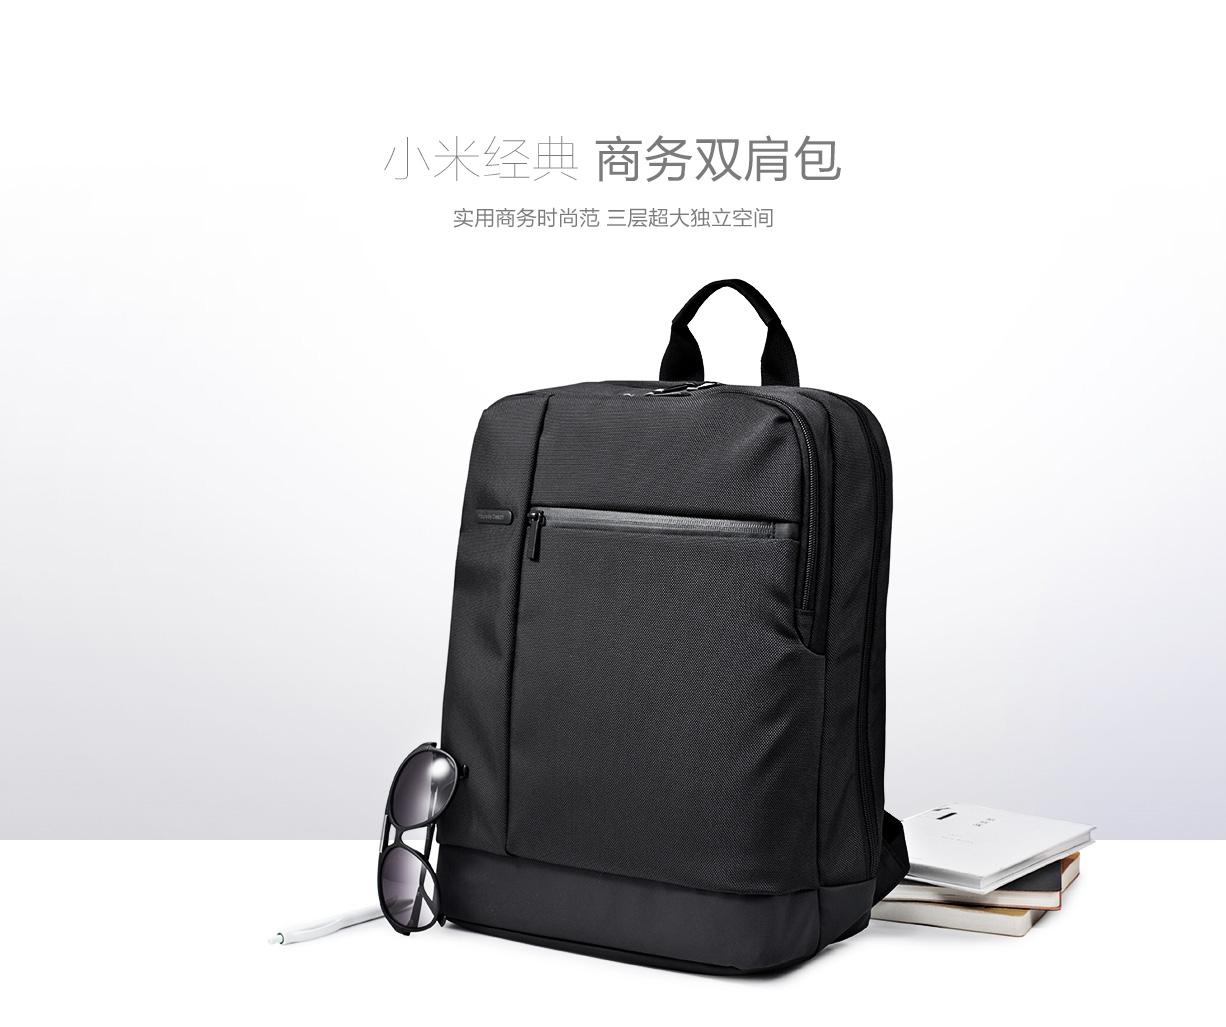 Xiaomi Classic Business Backpack - กระเป๋าเป้สะพายหลัง คลาสสิค บิสเนส